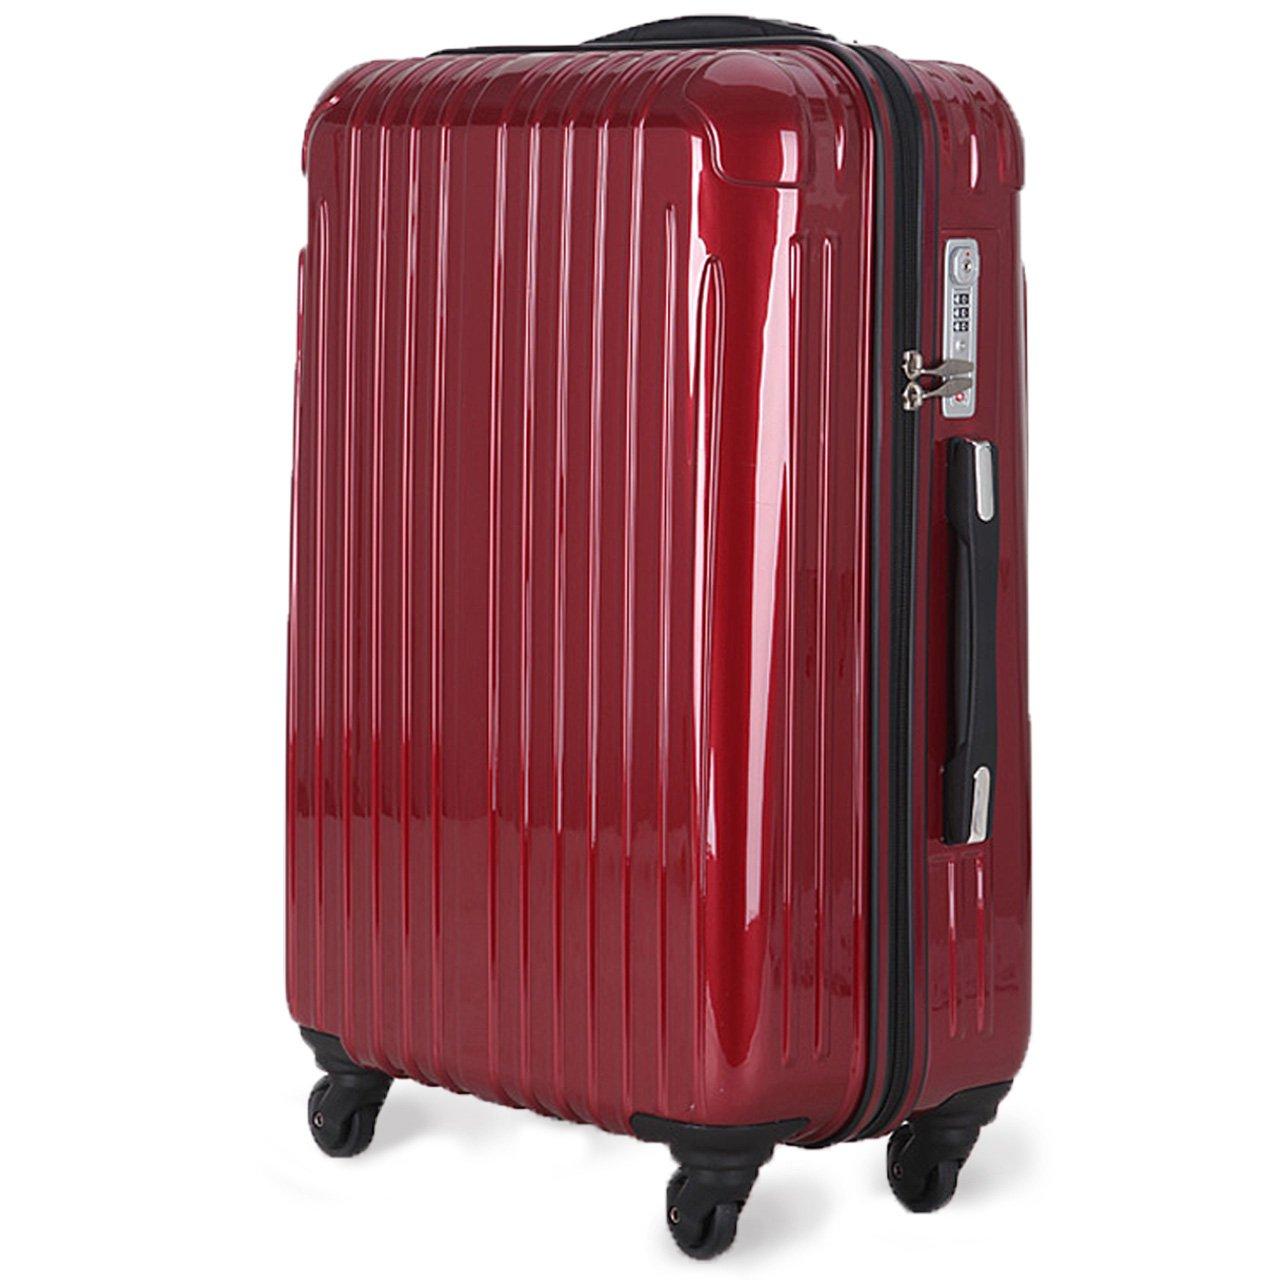 strike[ストライク]超軽量 2年保証 スーツケース TSAロック搭載 旅行バック トランクケース 旅行カバン B072HN17LX 中型Mサイズ(4-7泊)|ワインレッド ワインレッド 中型Mサイズ(4-7泊)